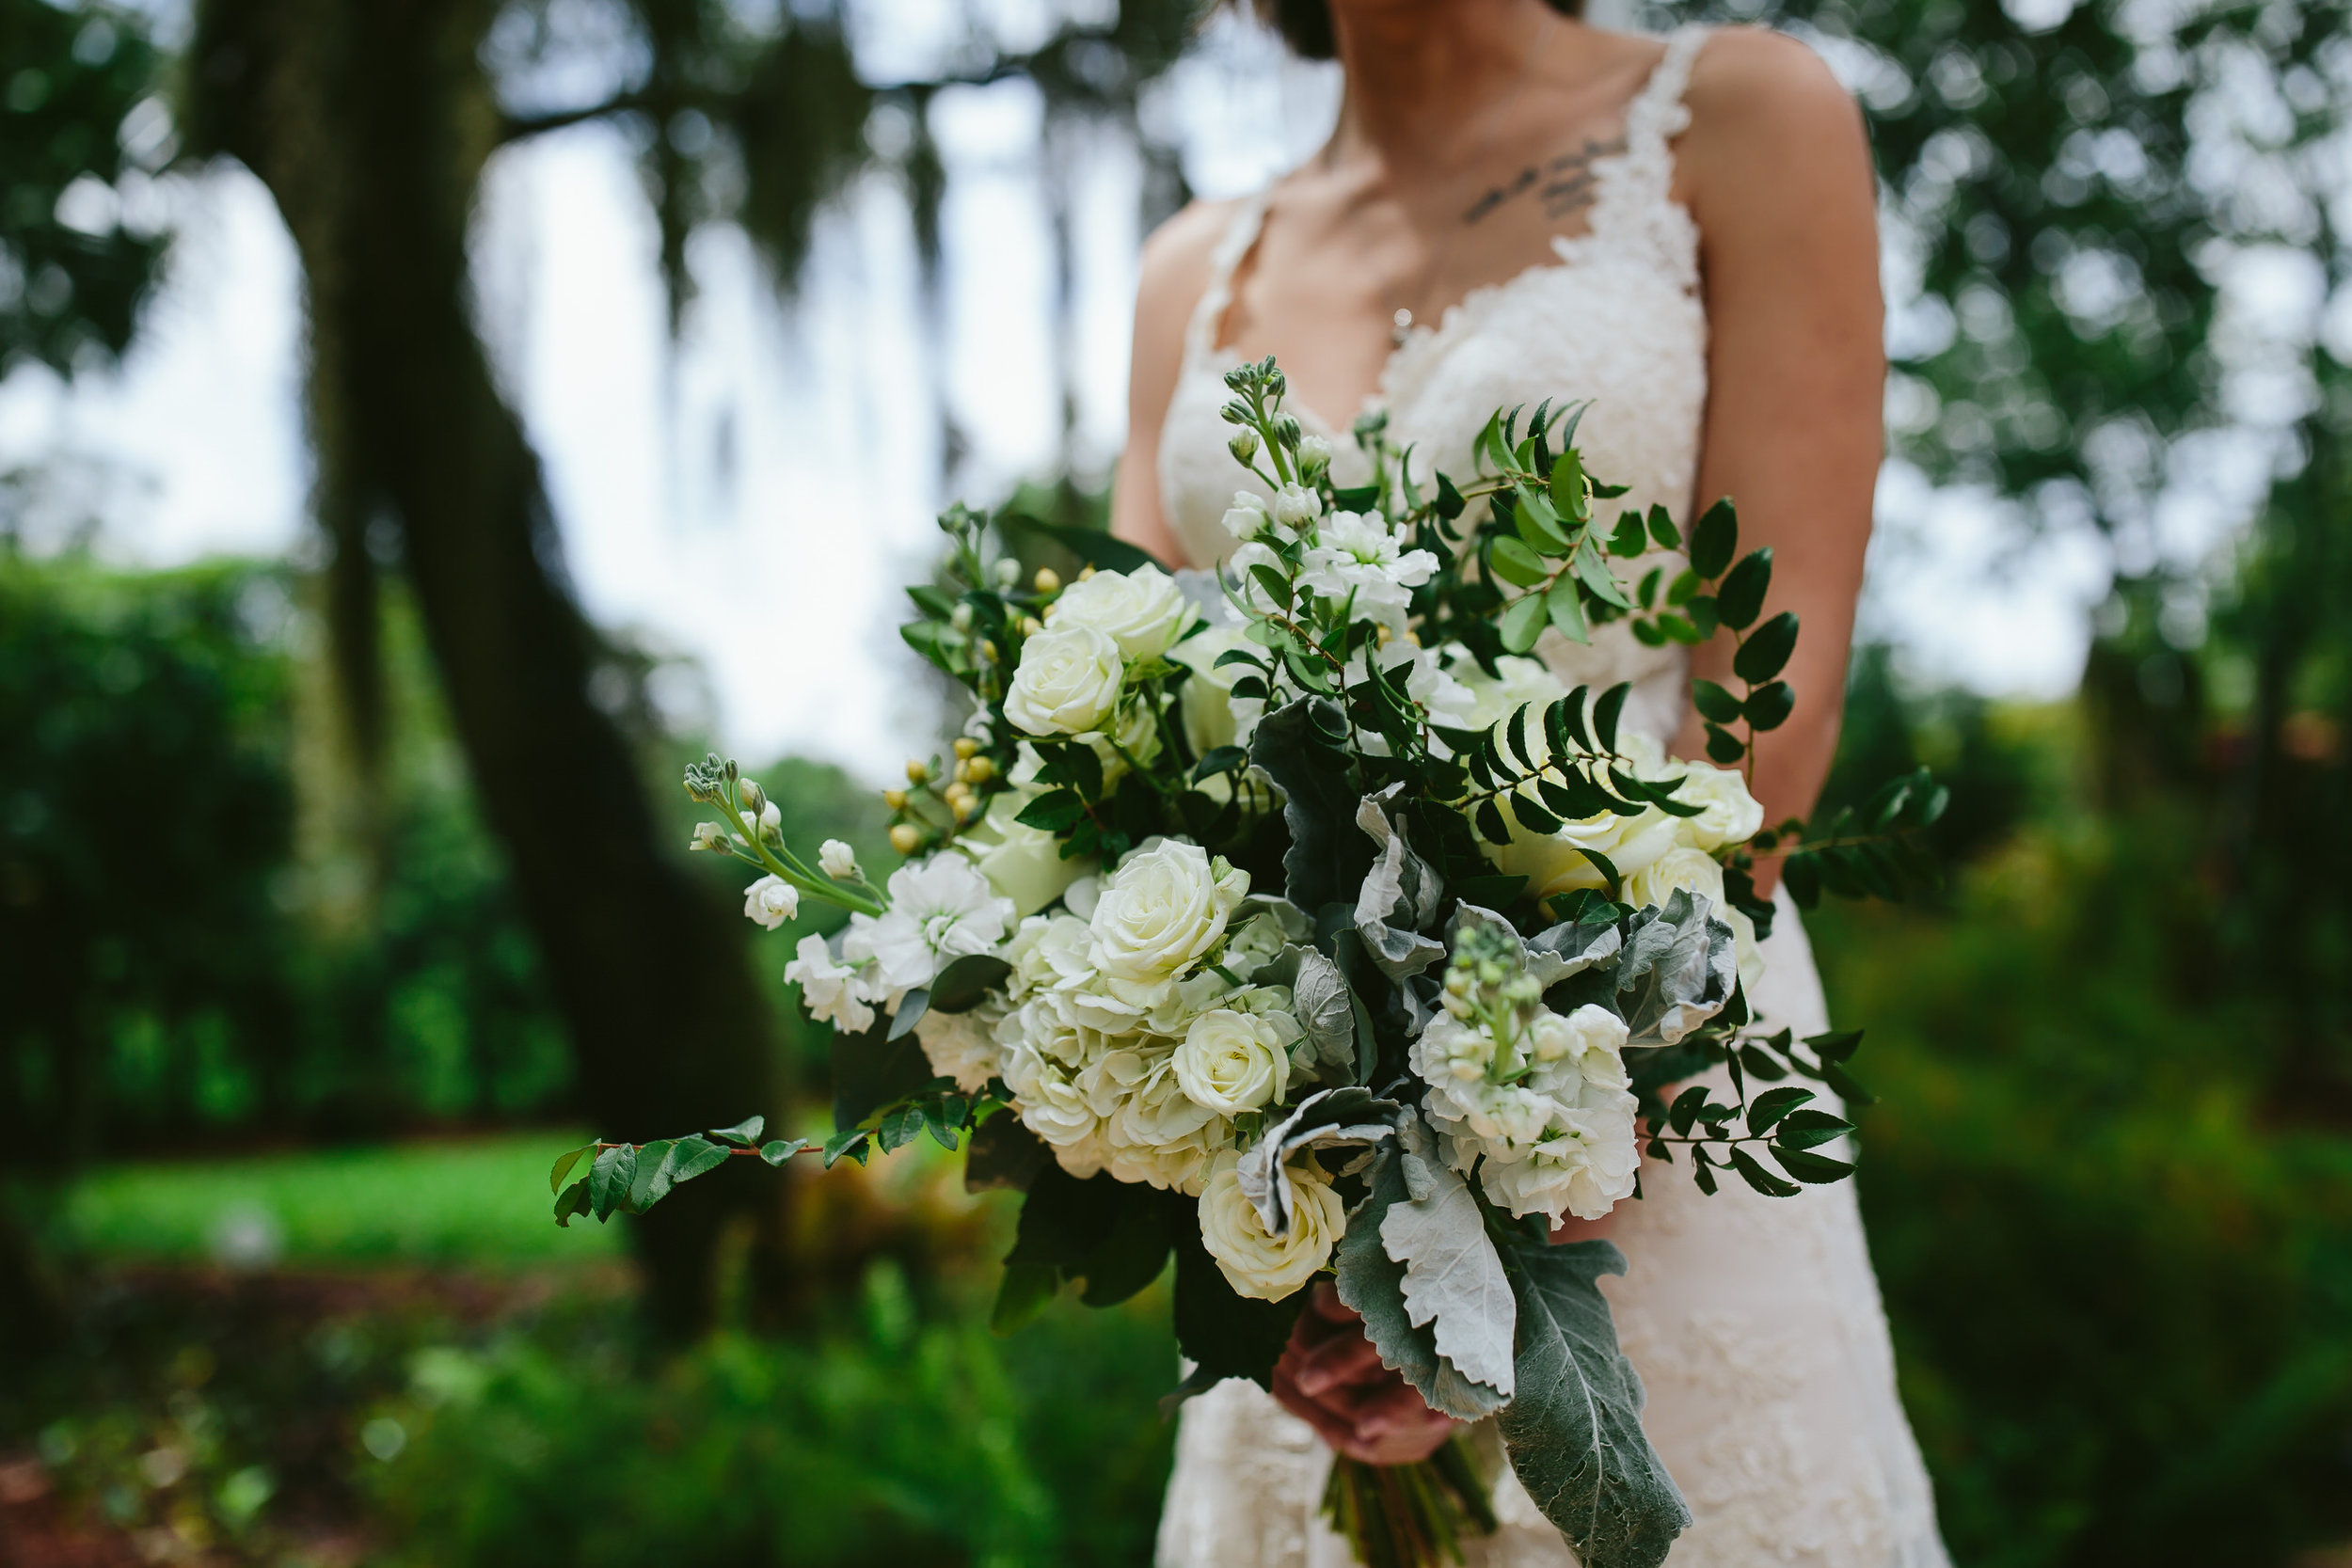 incredible_bridal_bouquet_tiny_house_photo_bride_wedding_day.jpg